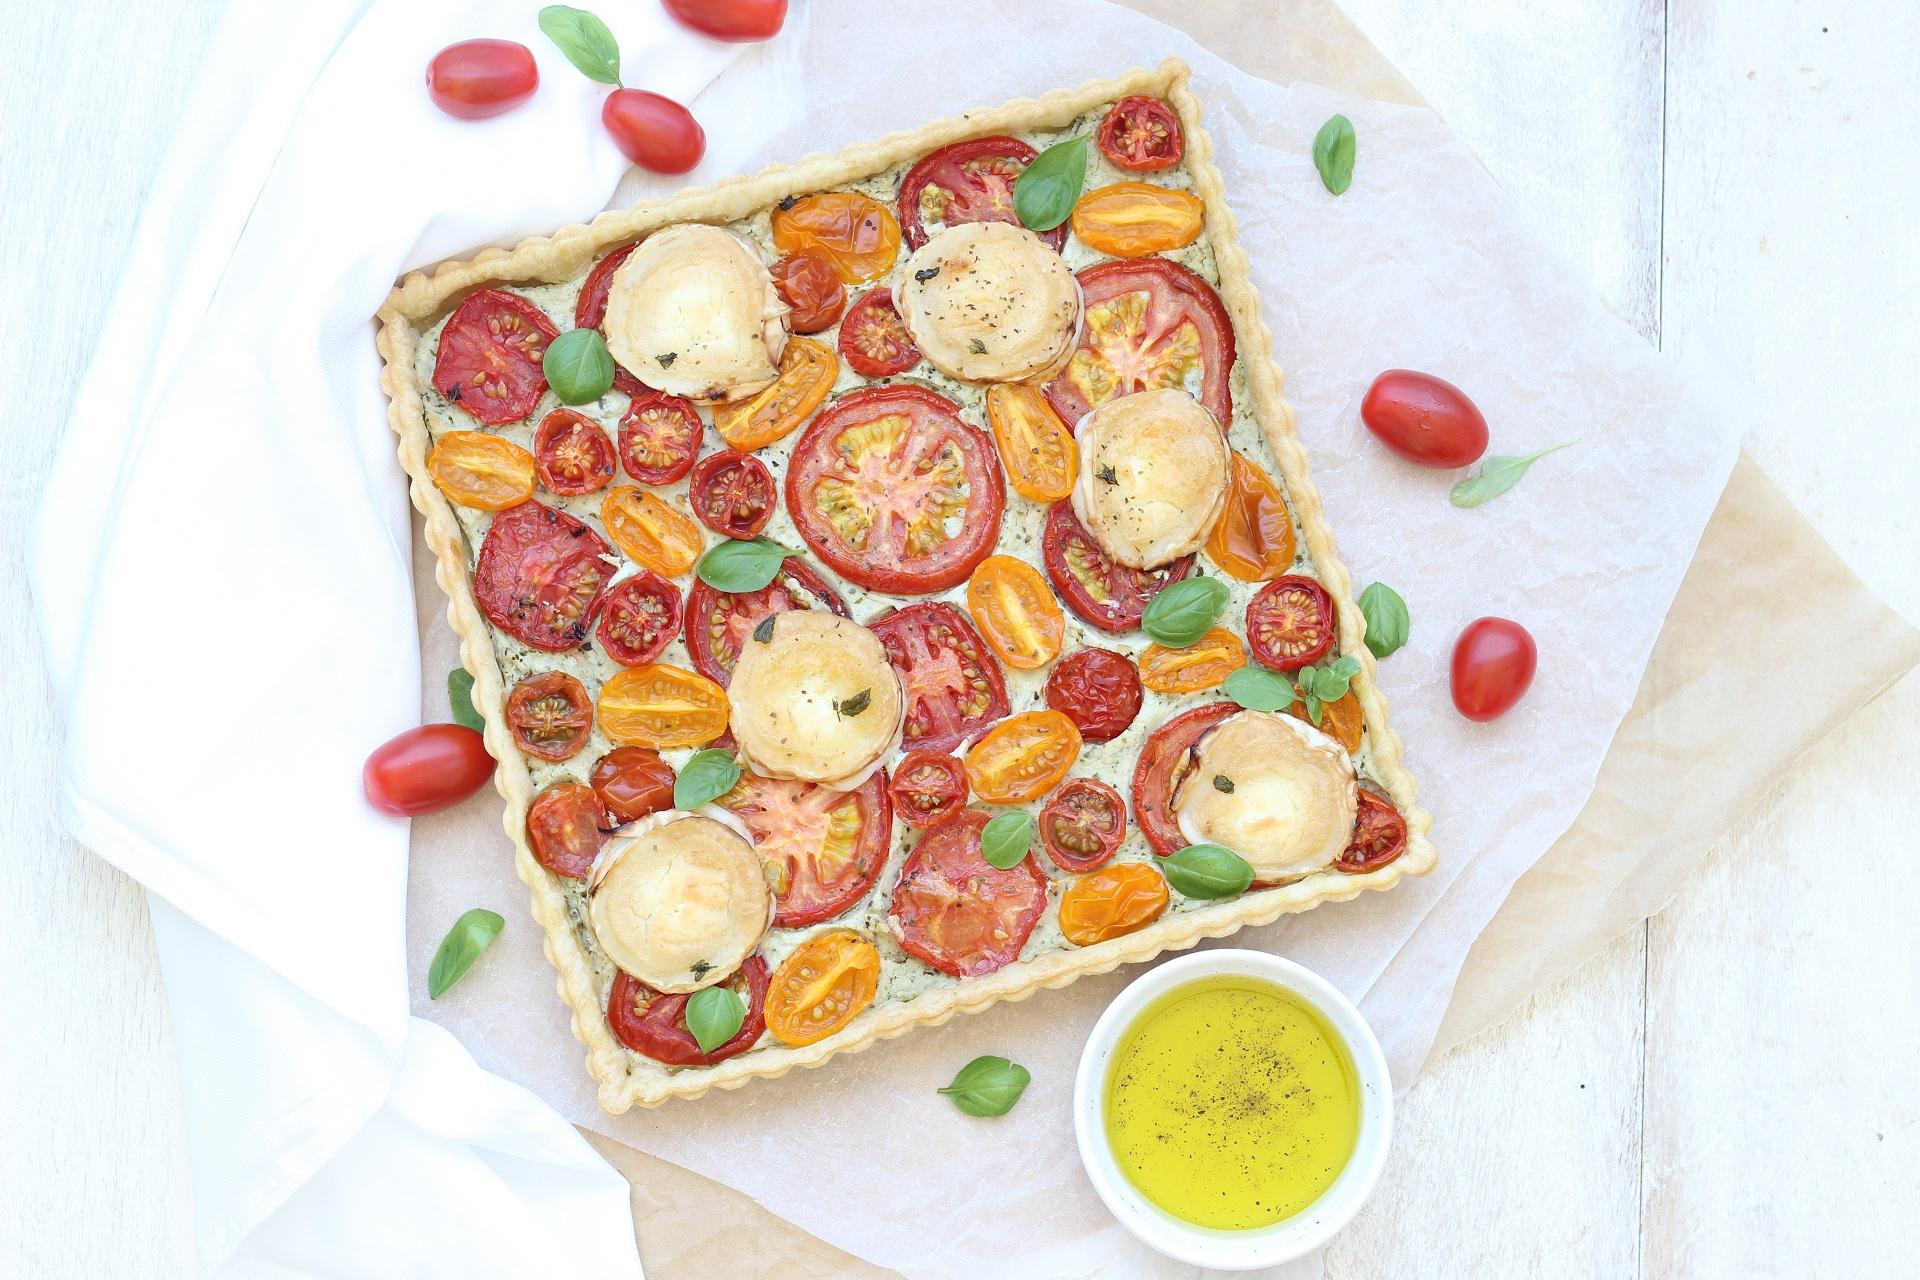 Torta salata con pomodori